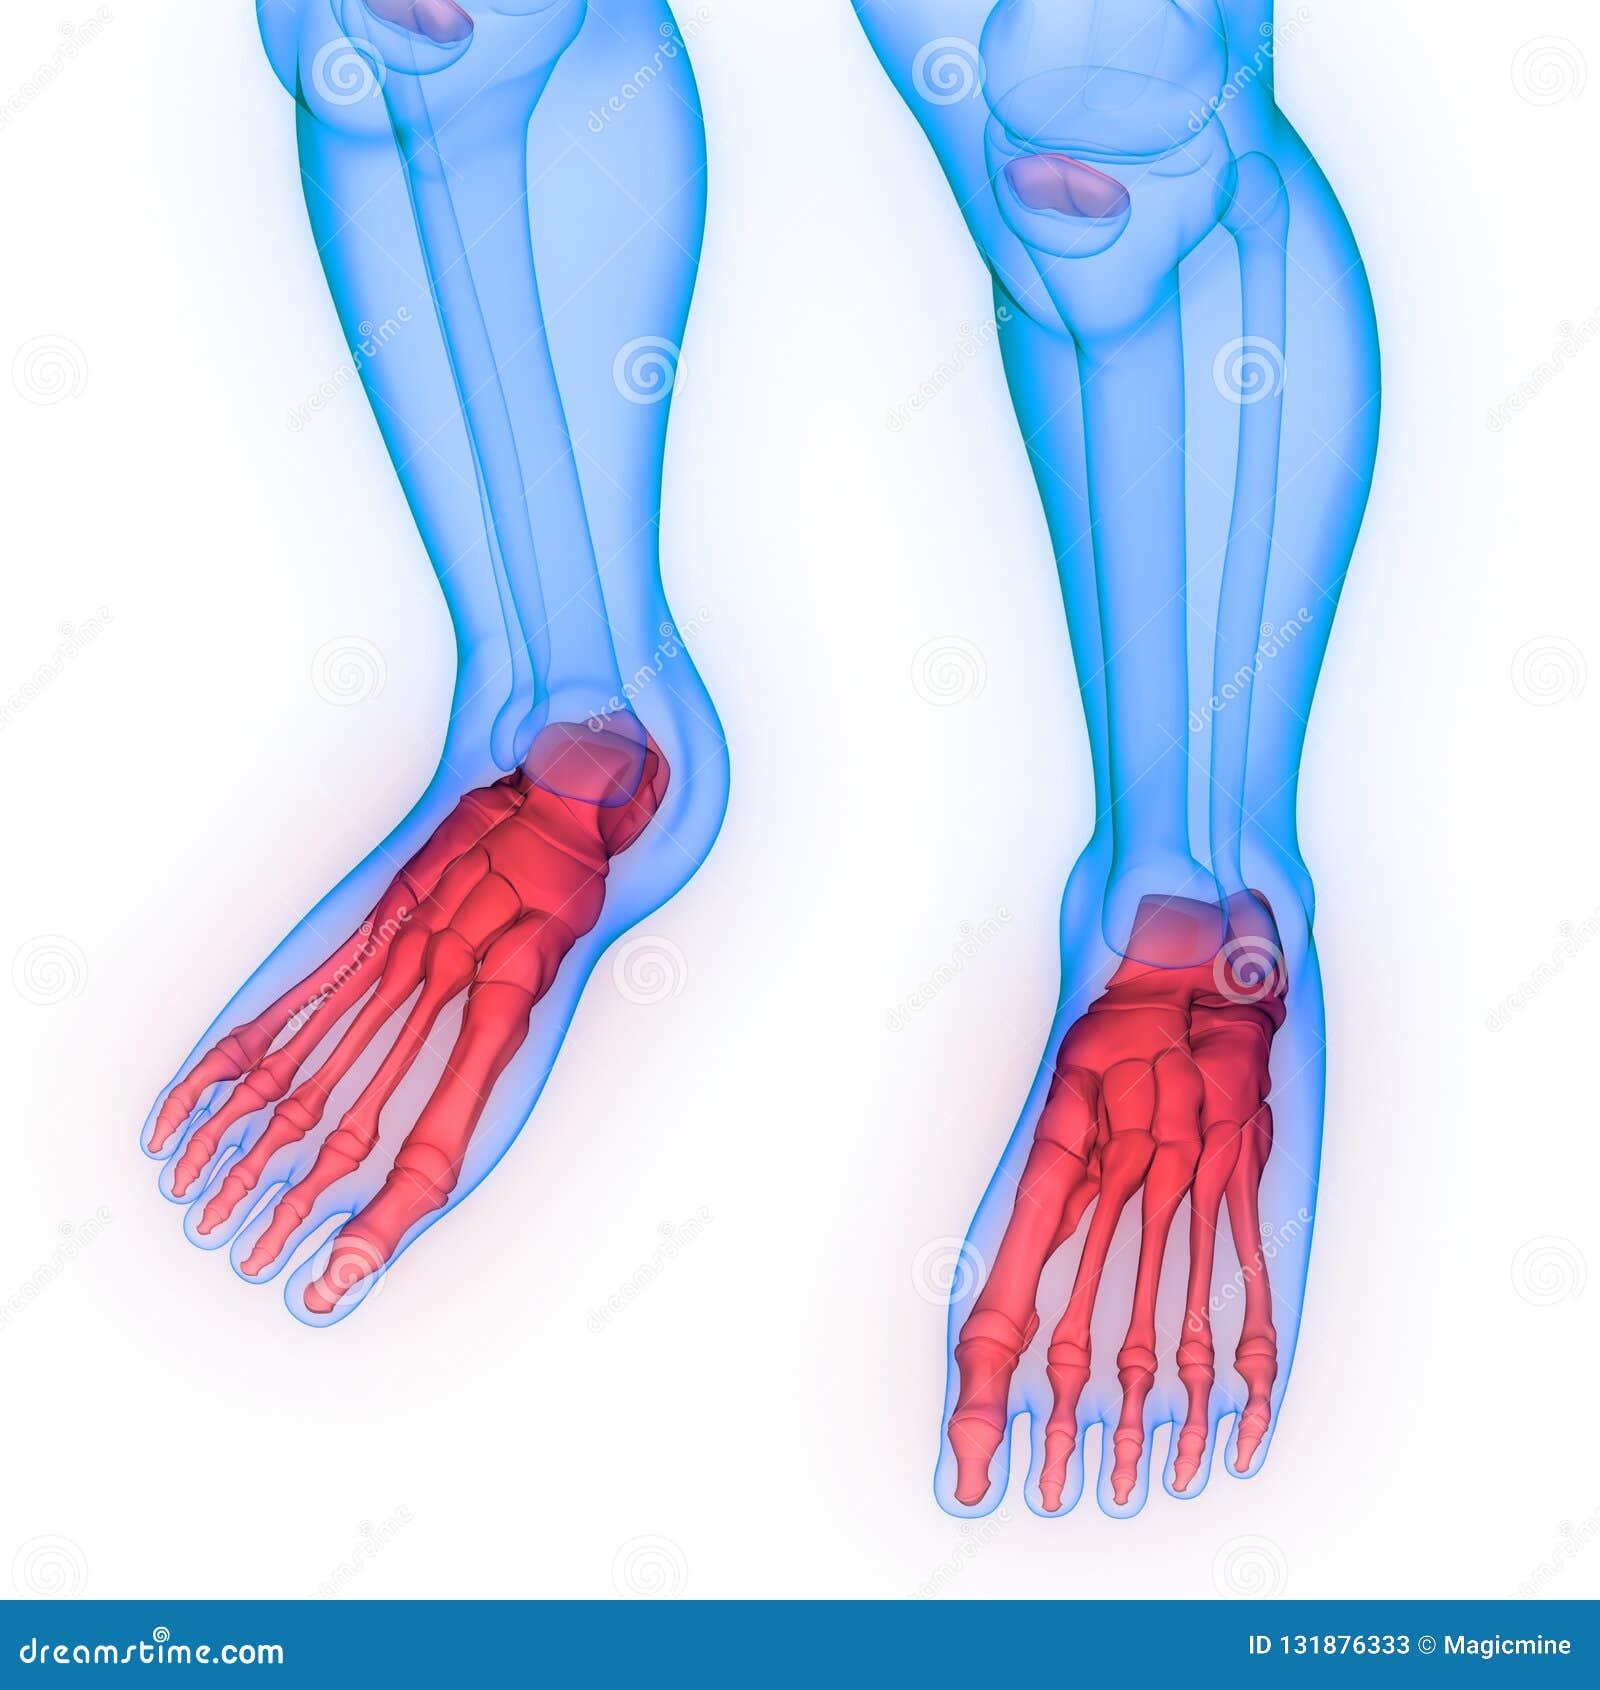 Human Body Skeleton System Foot Bone Joints Anatomy Stock Image